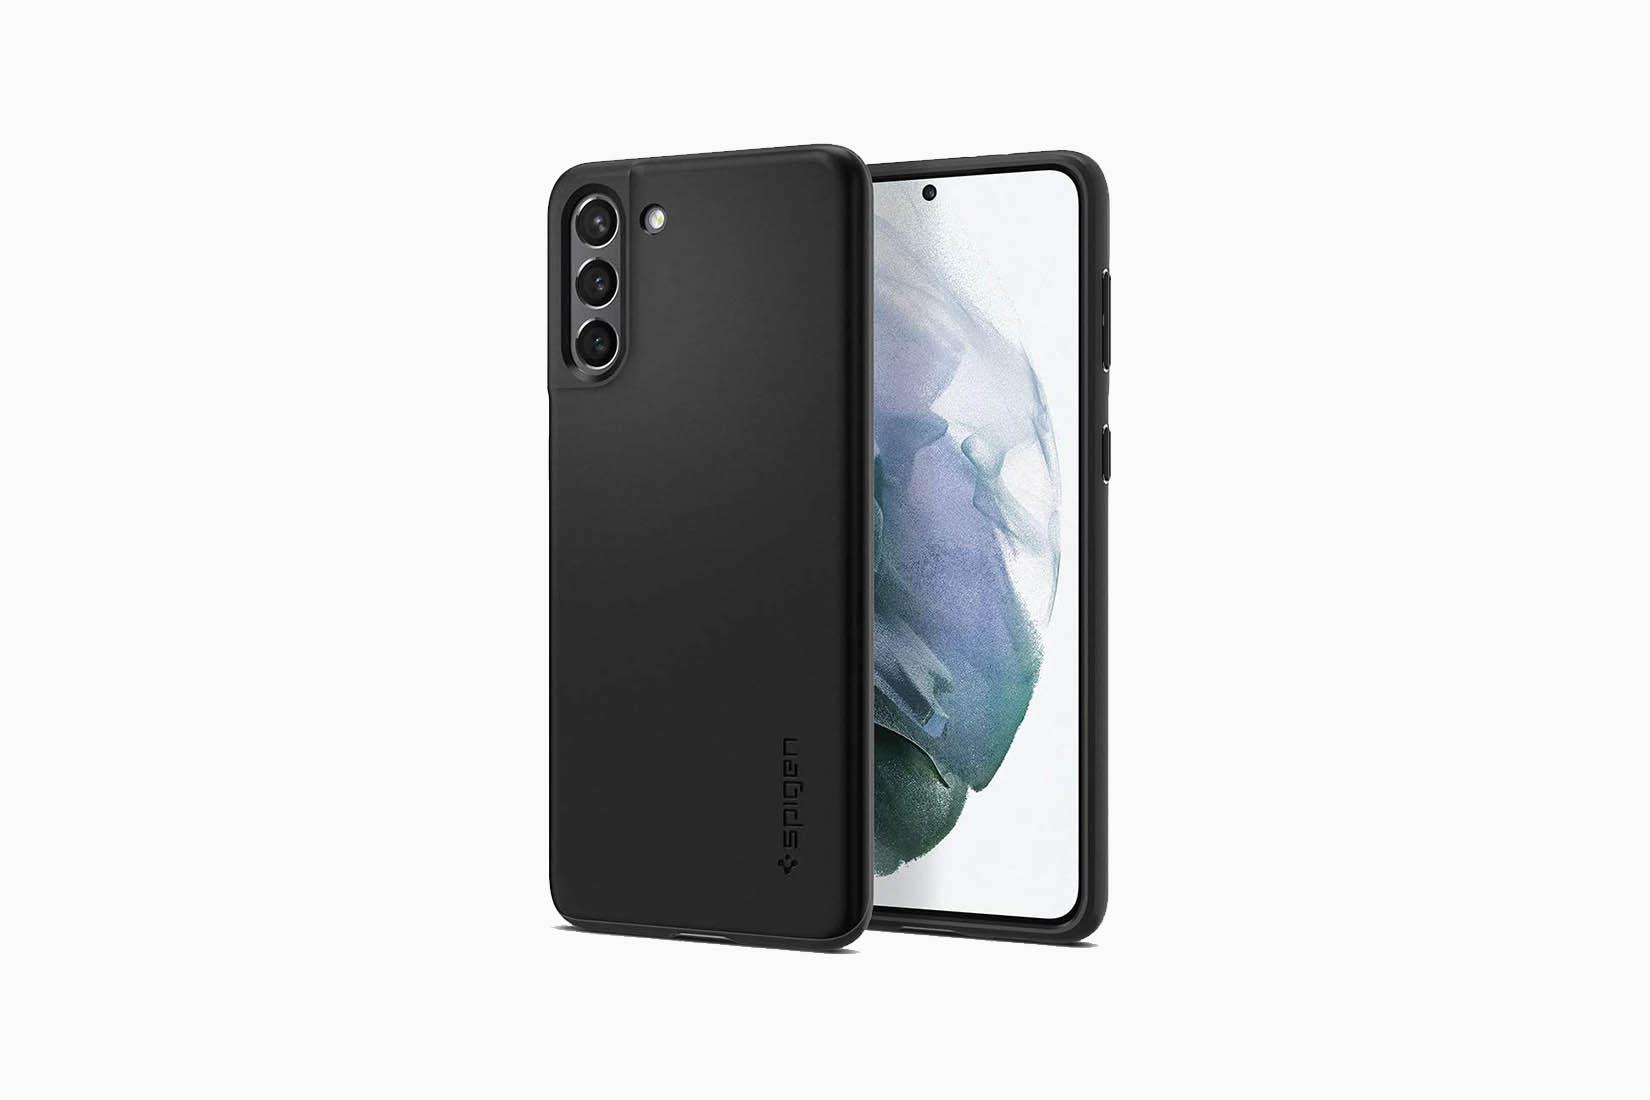 Best Samsung Case Spigen Thin Fit Review - Luxe Digital